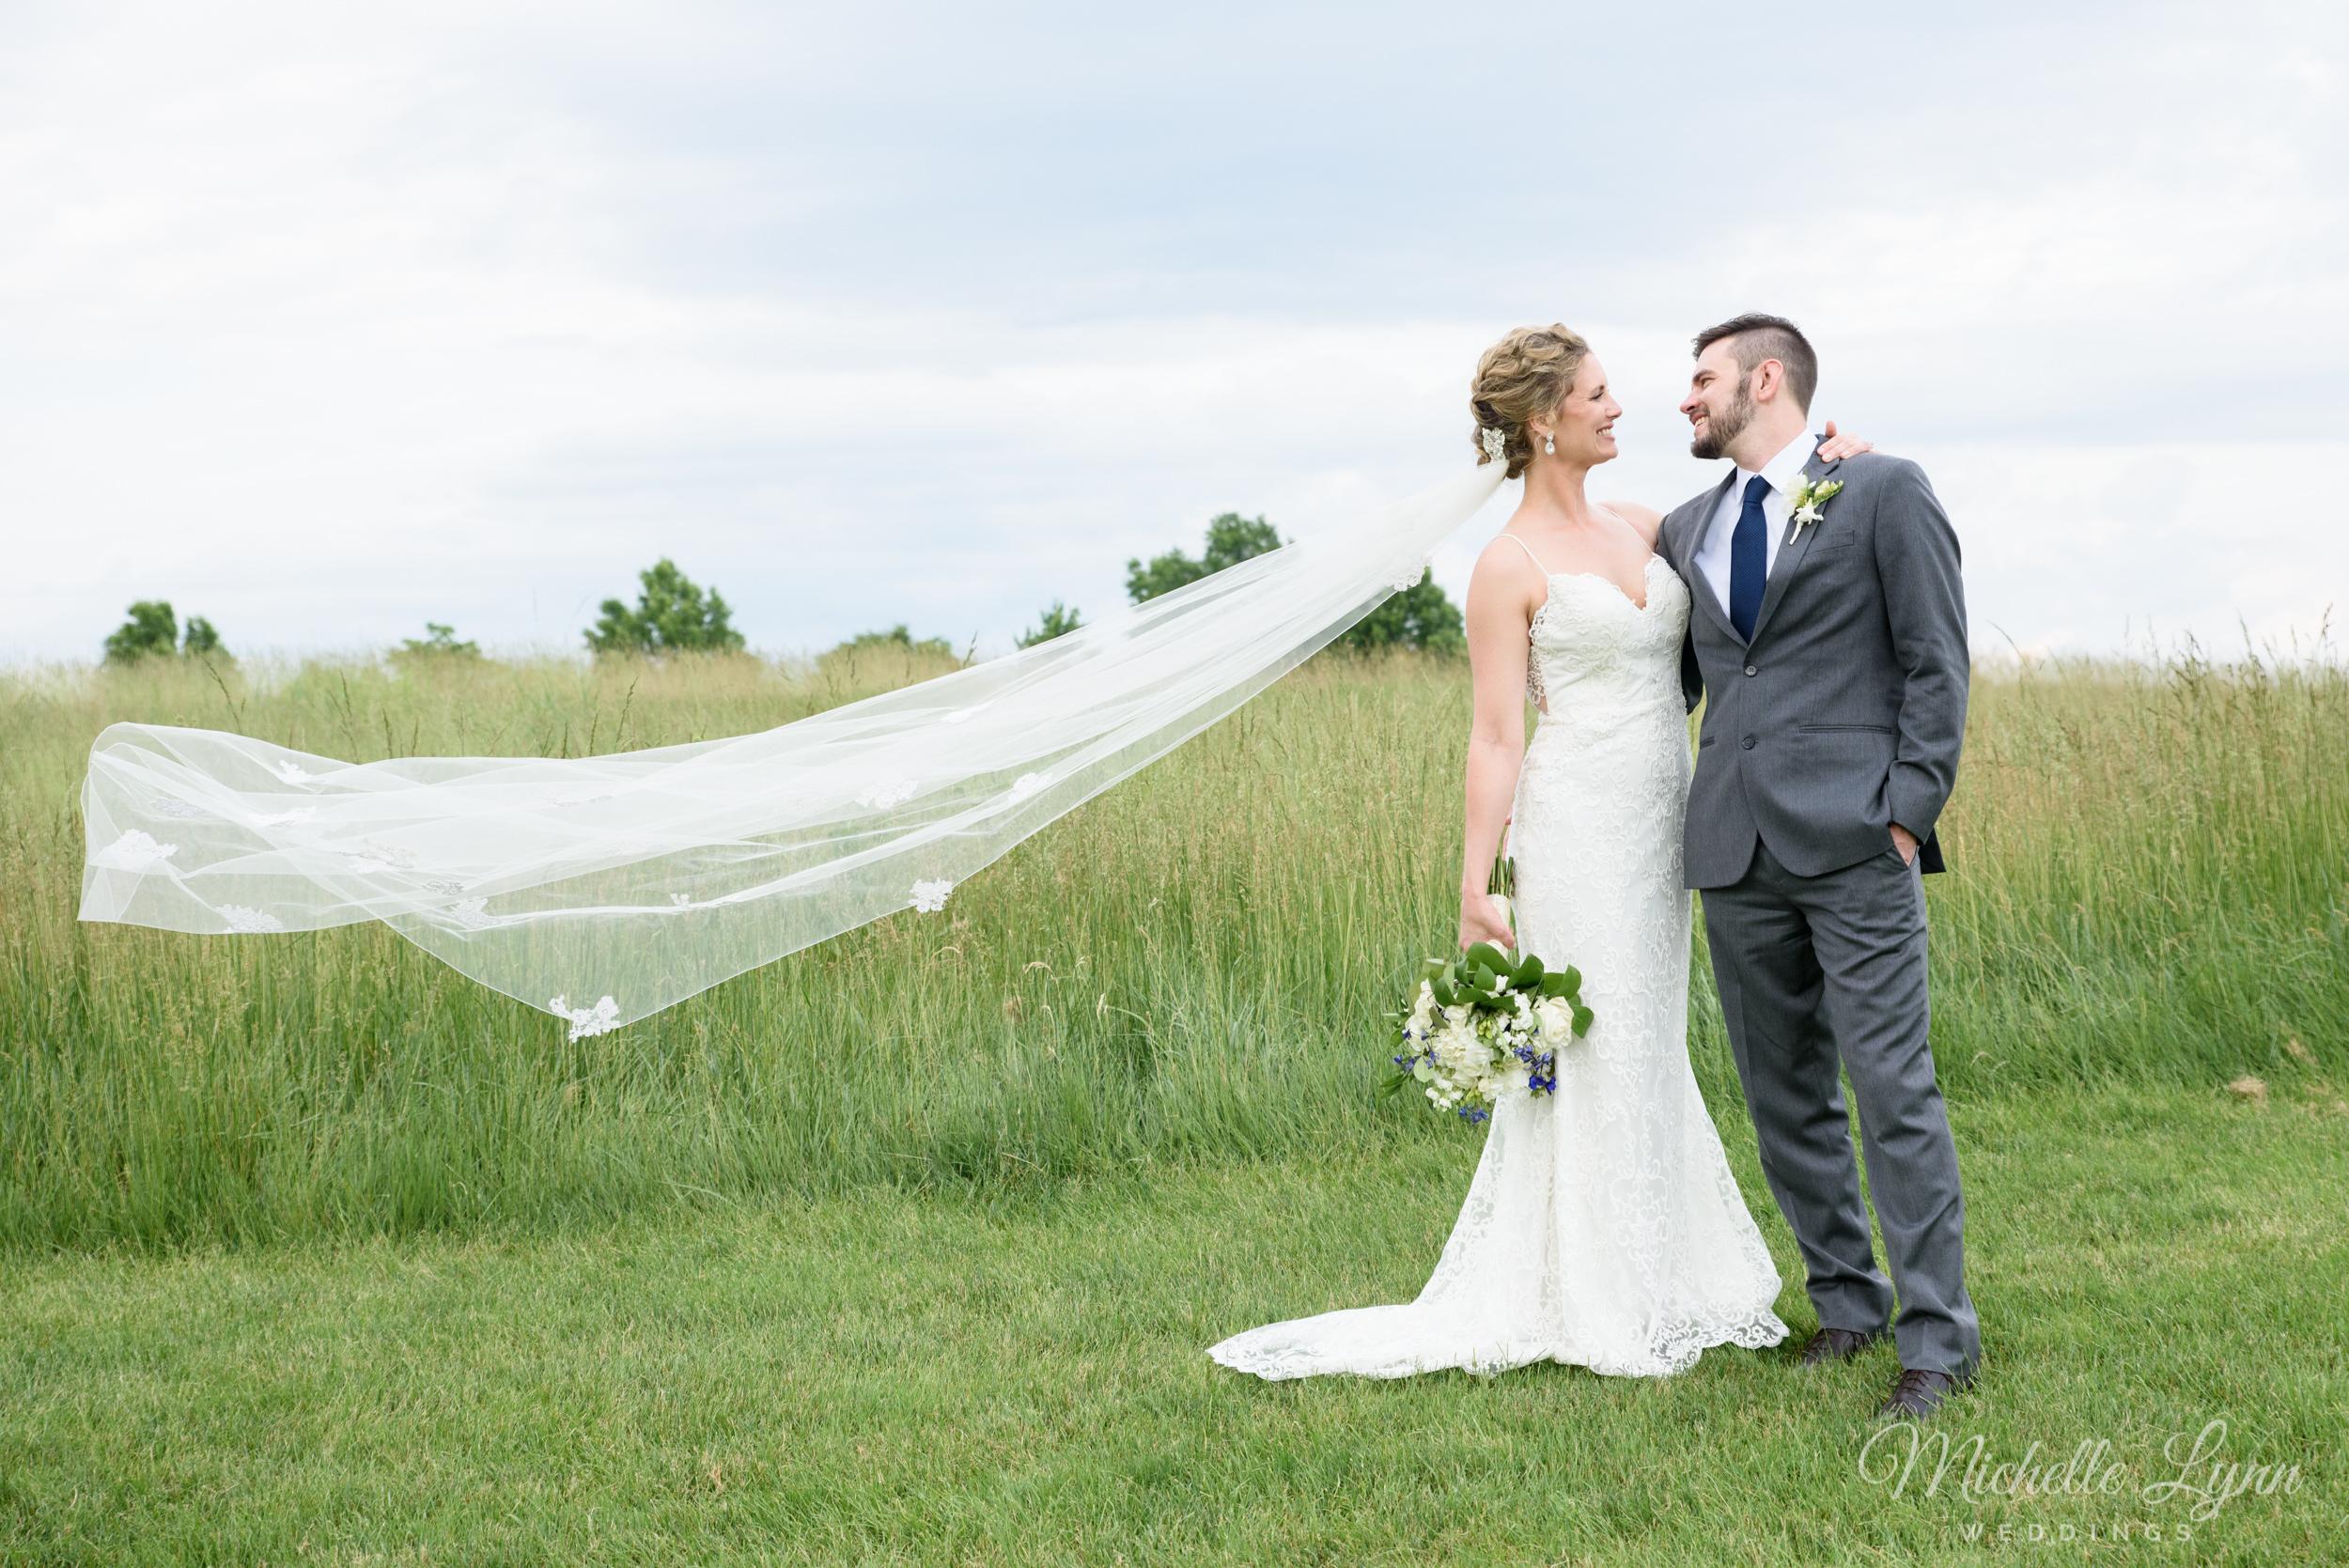 mlw-jericho-national-golf-club-wedding-photography-1.jpg